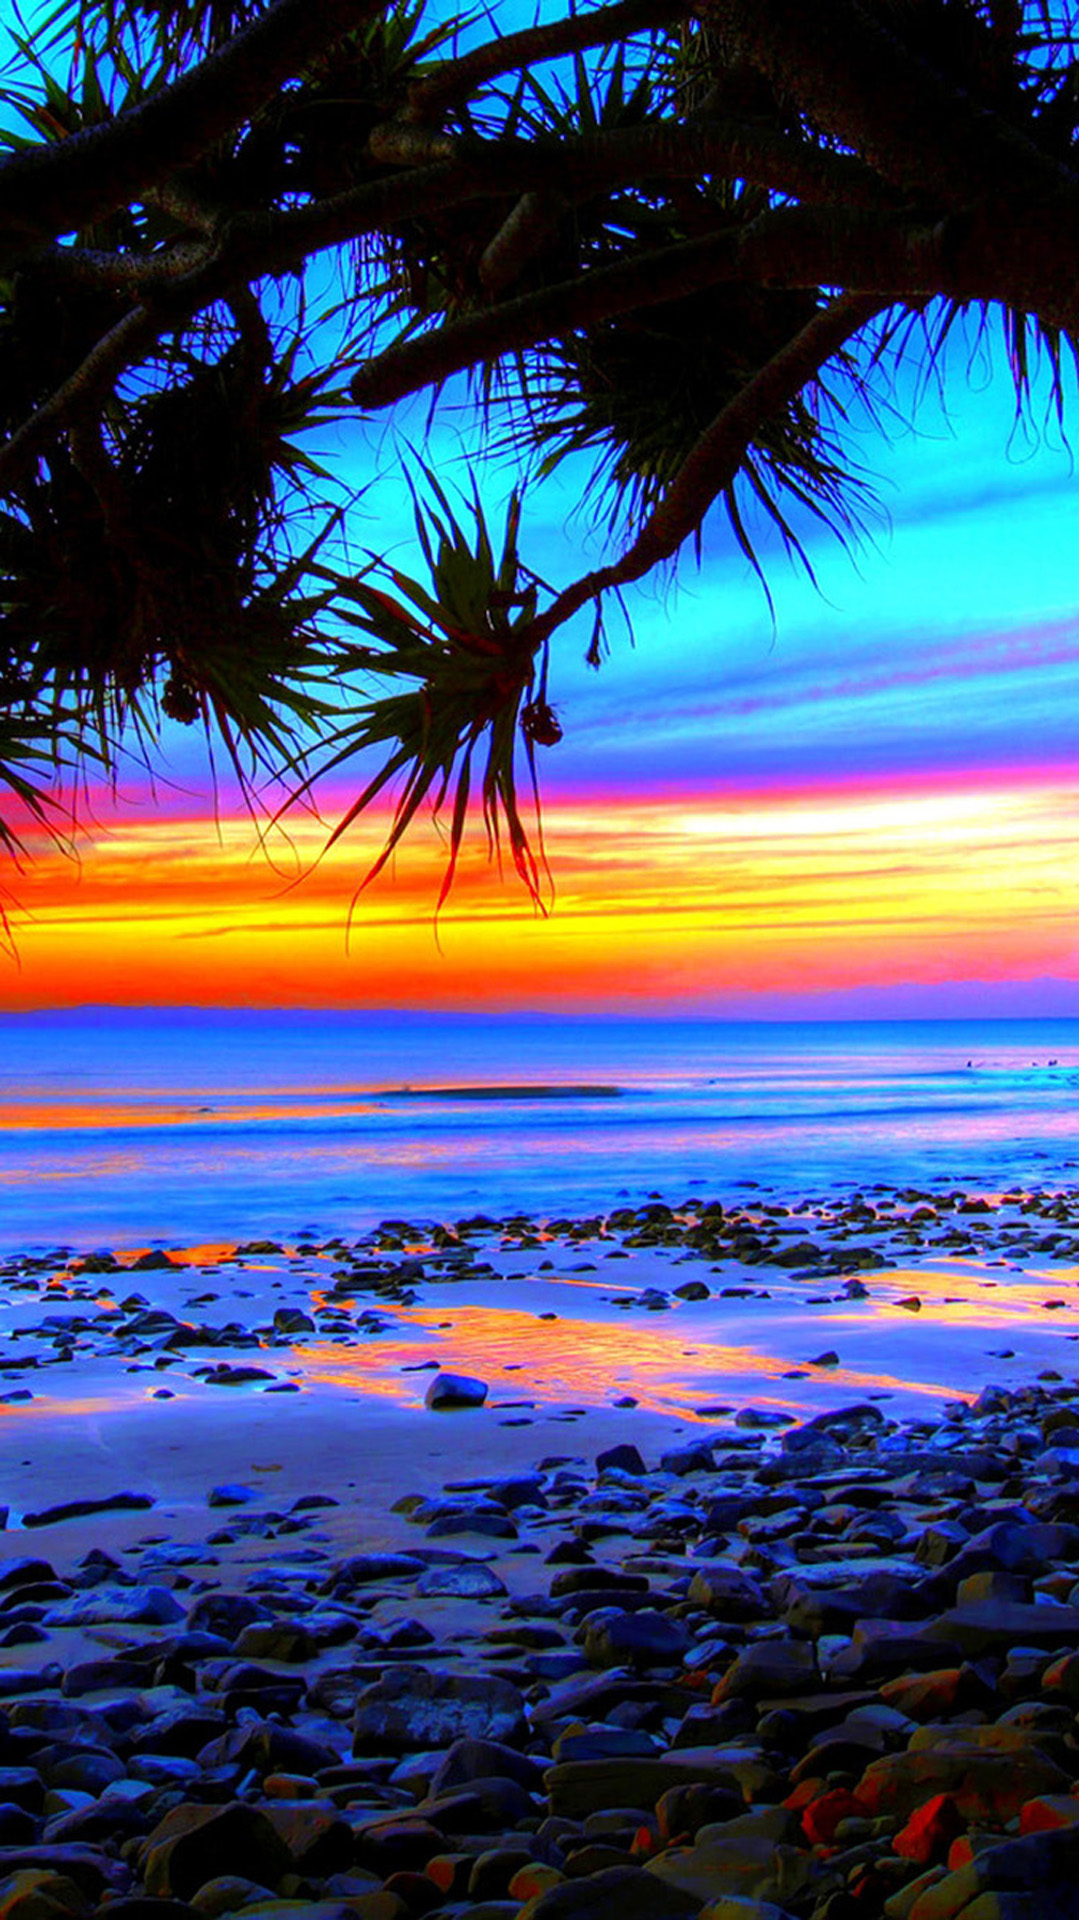 Iphoneのビーチの背景 トロピカル壁紙hd 450x800 Wallpapertip